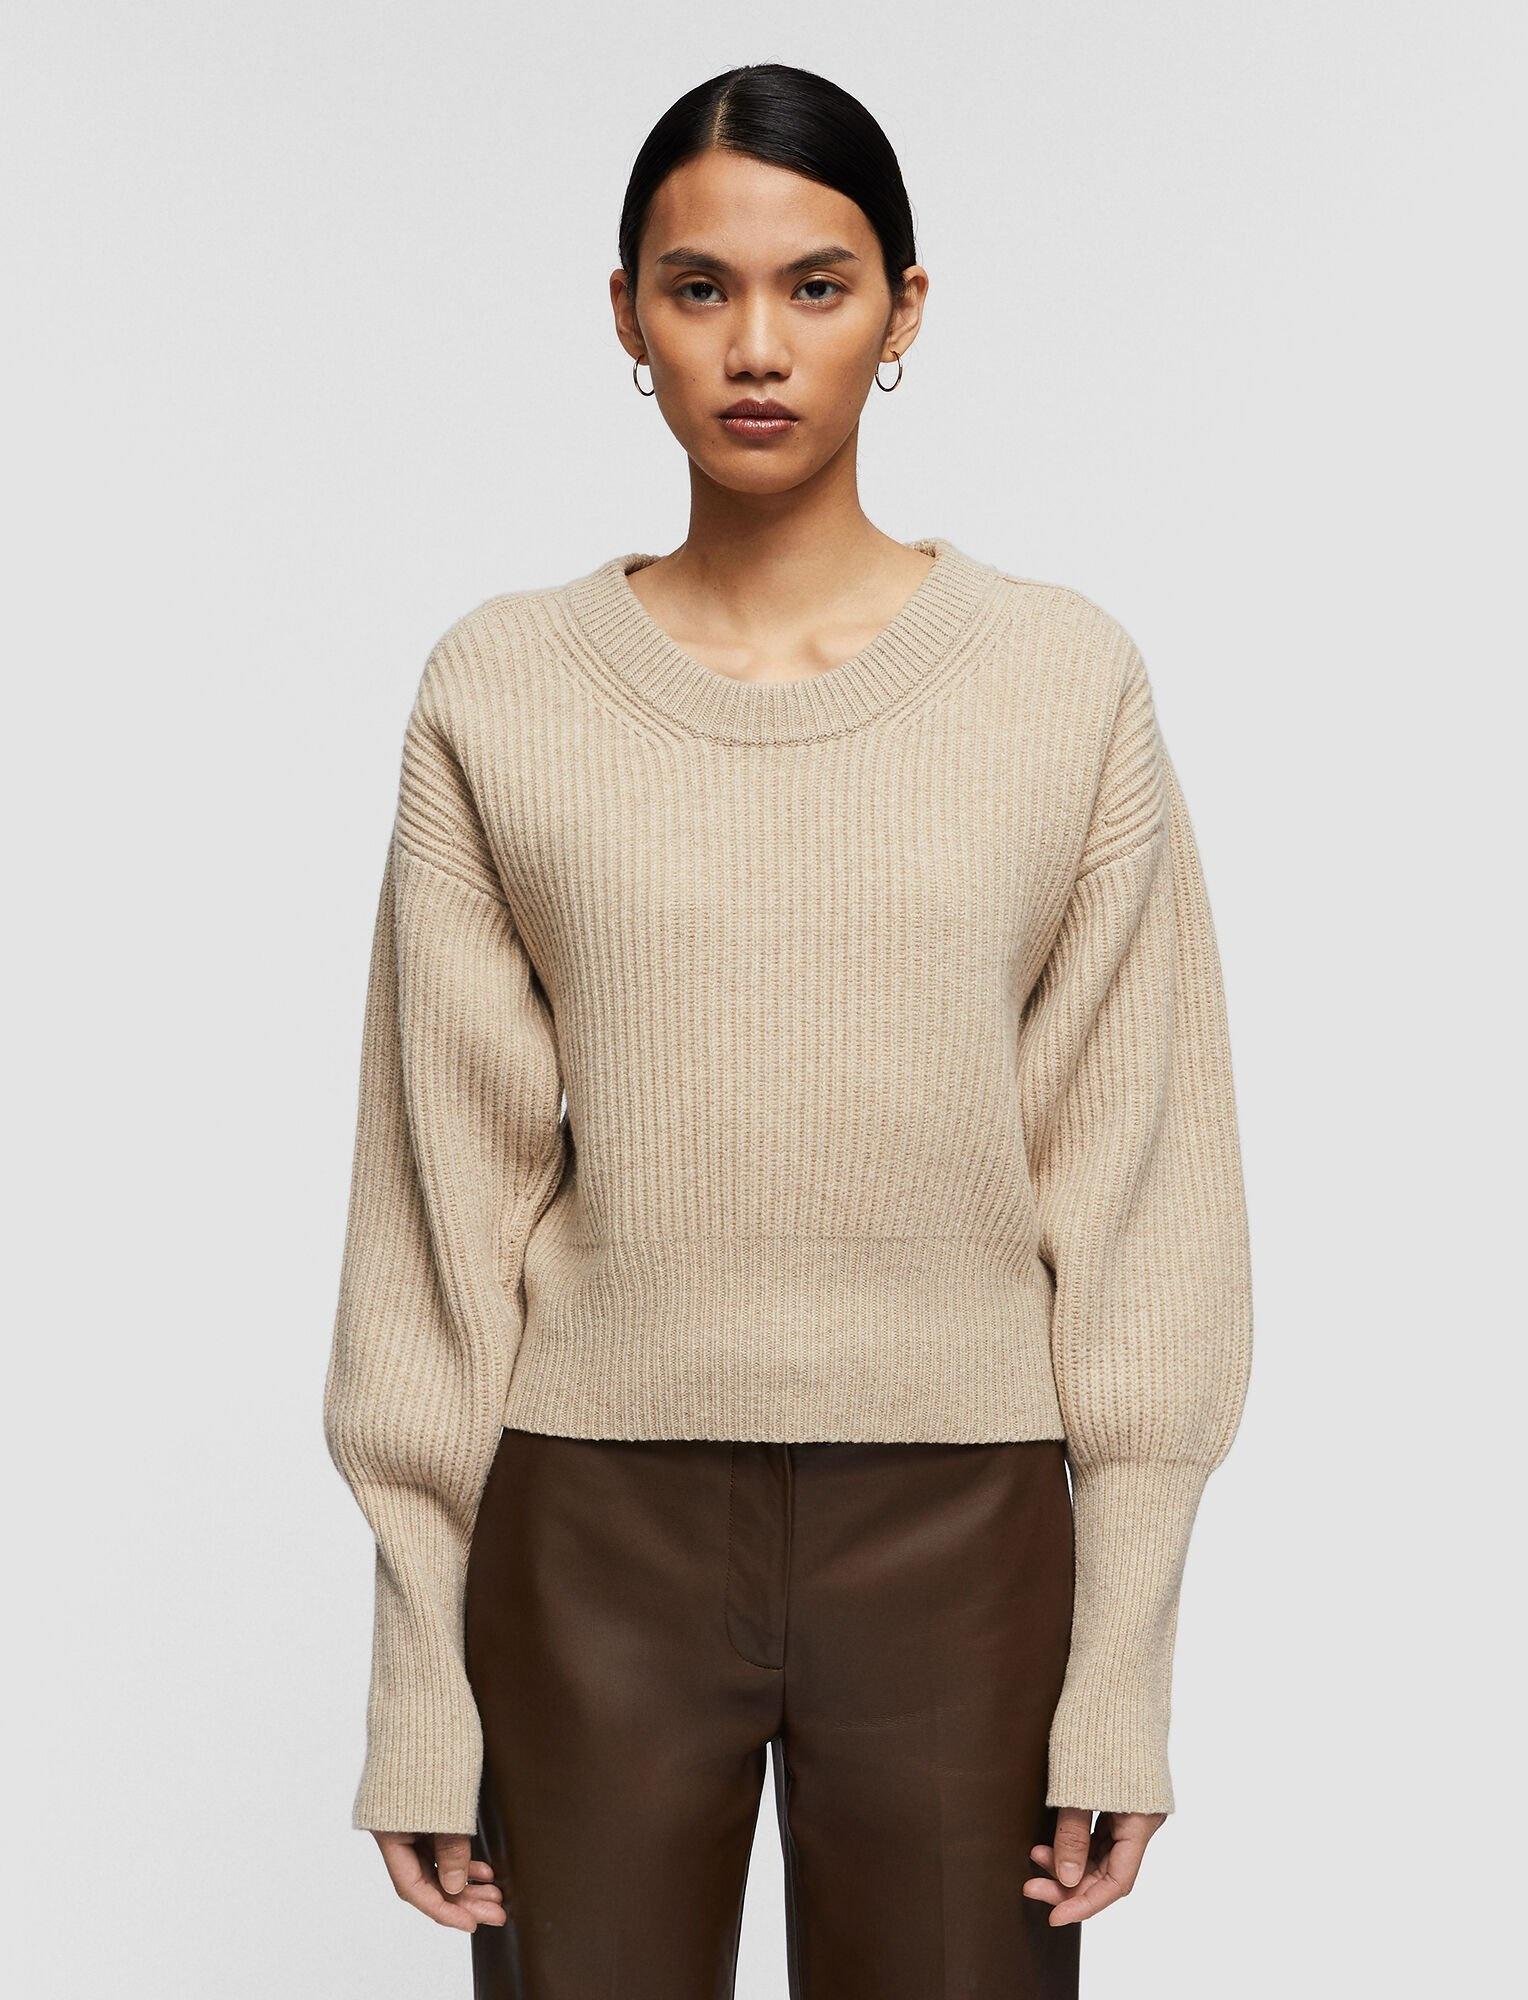 Round Neck Sweater Cardigan Stitch Sandshell